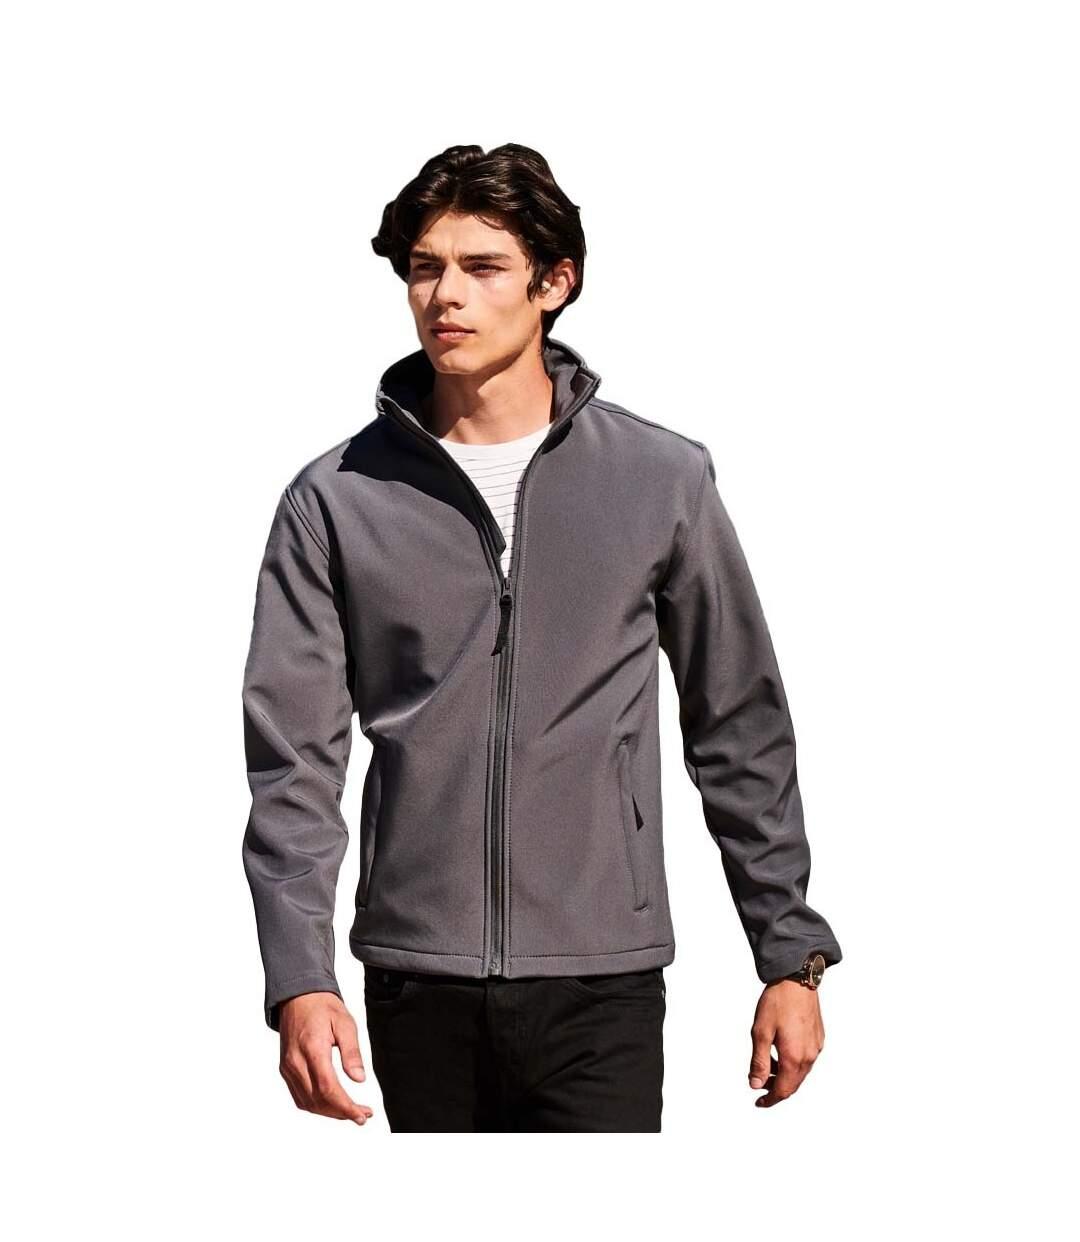 Regatta Reid Mens Softshell Wind Resistant Water Repellent Jacket (Black) - UTRG1599